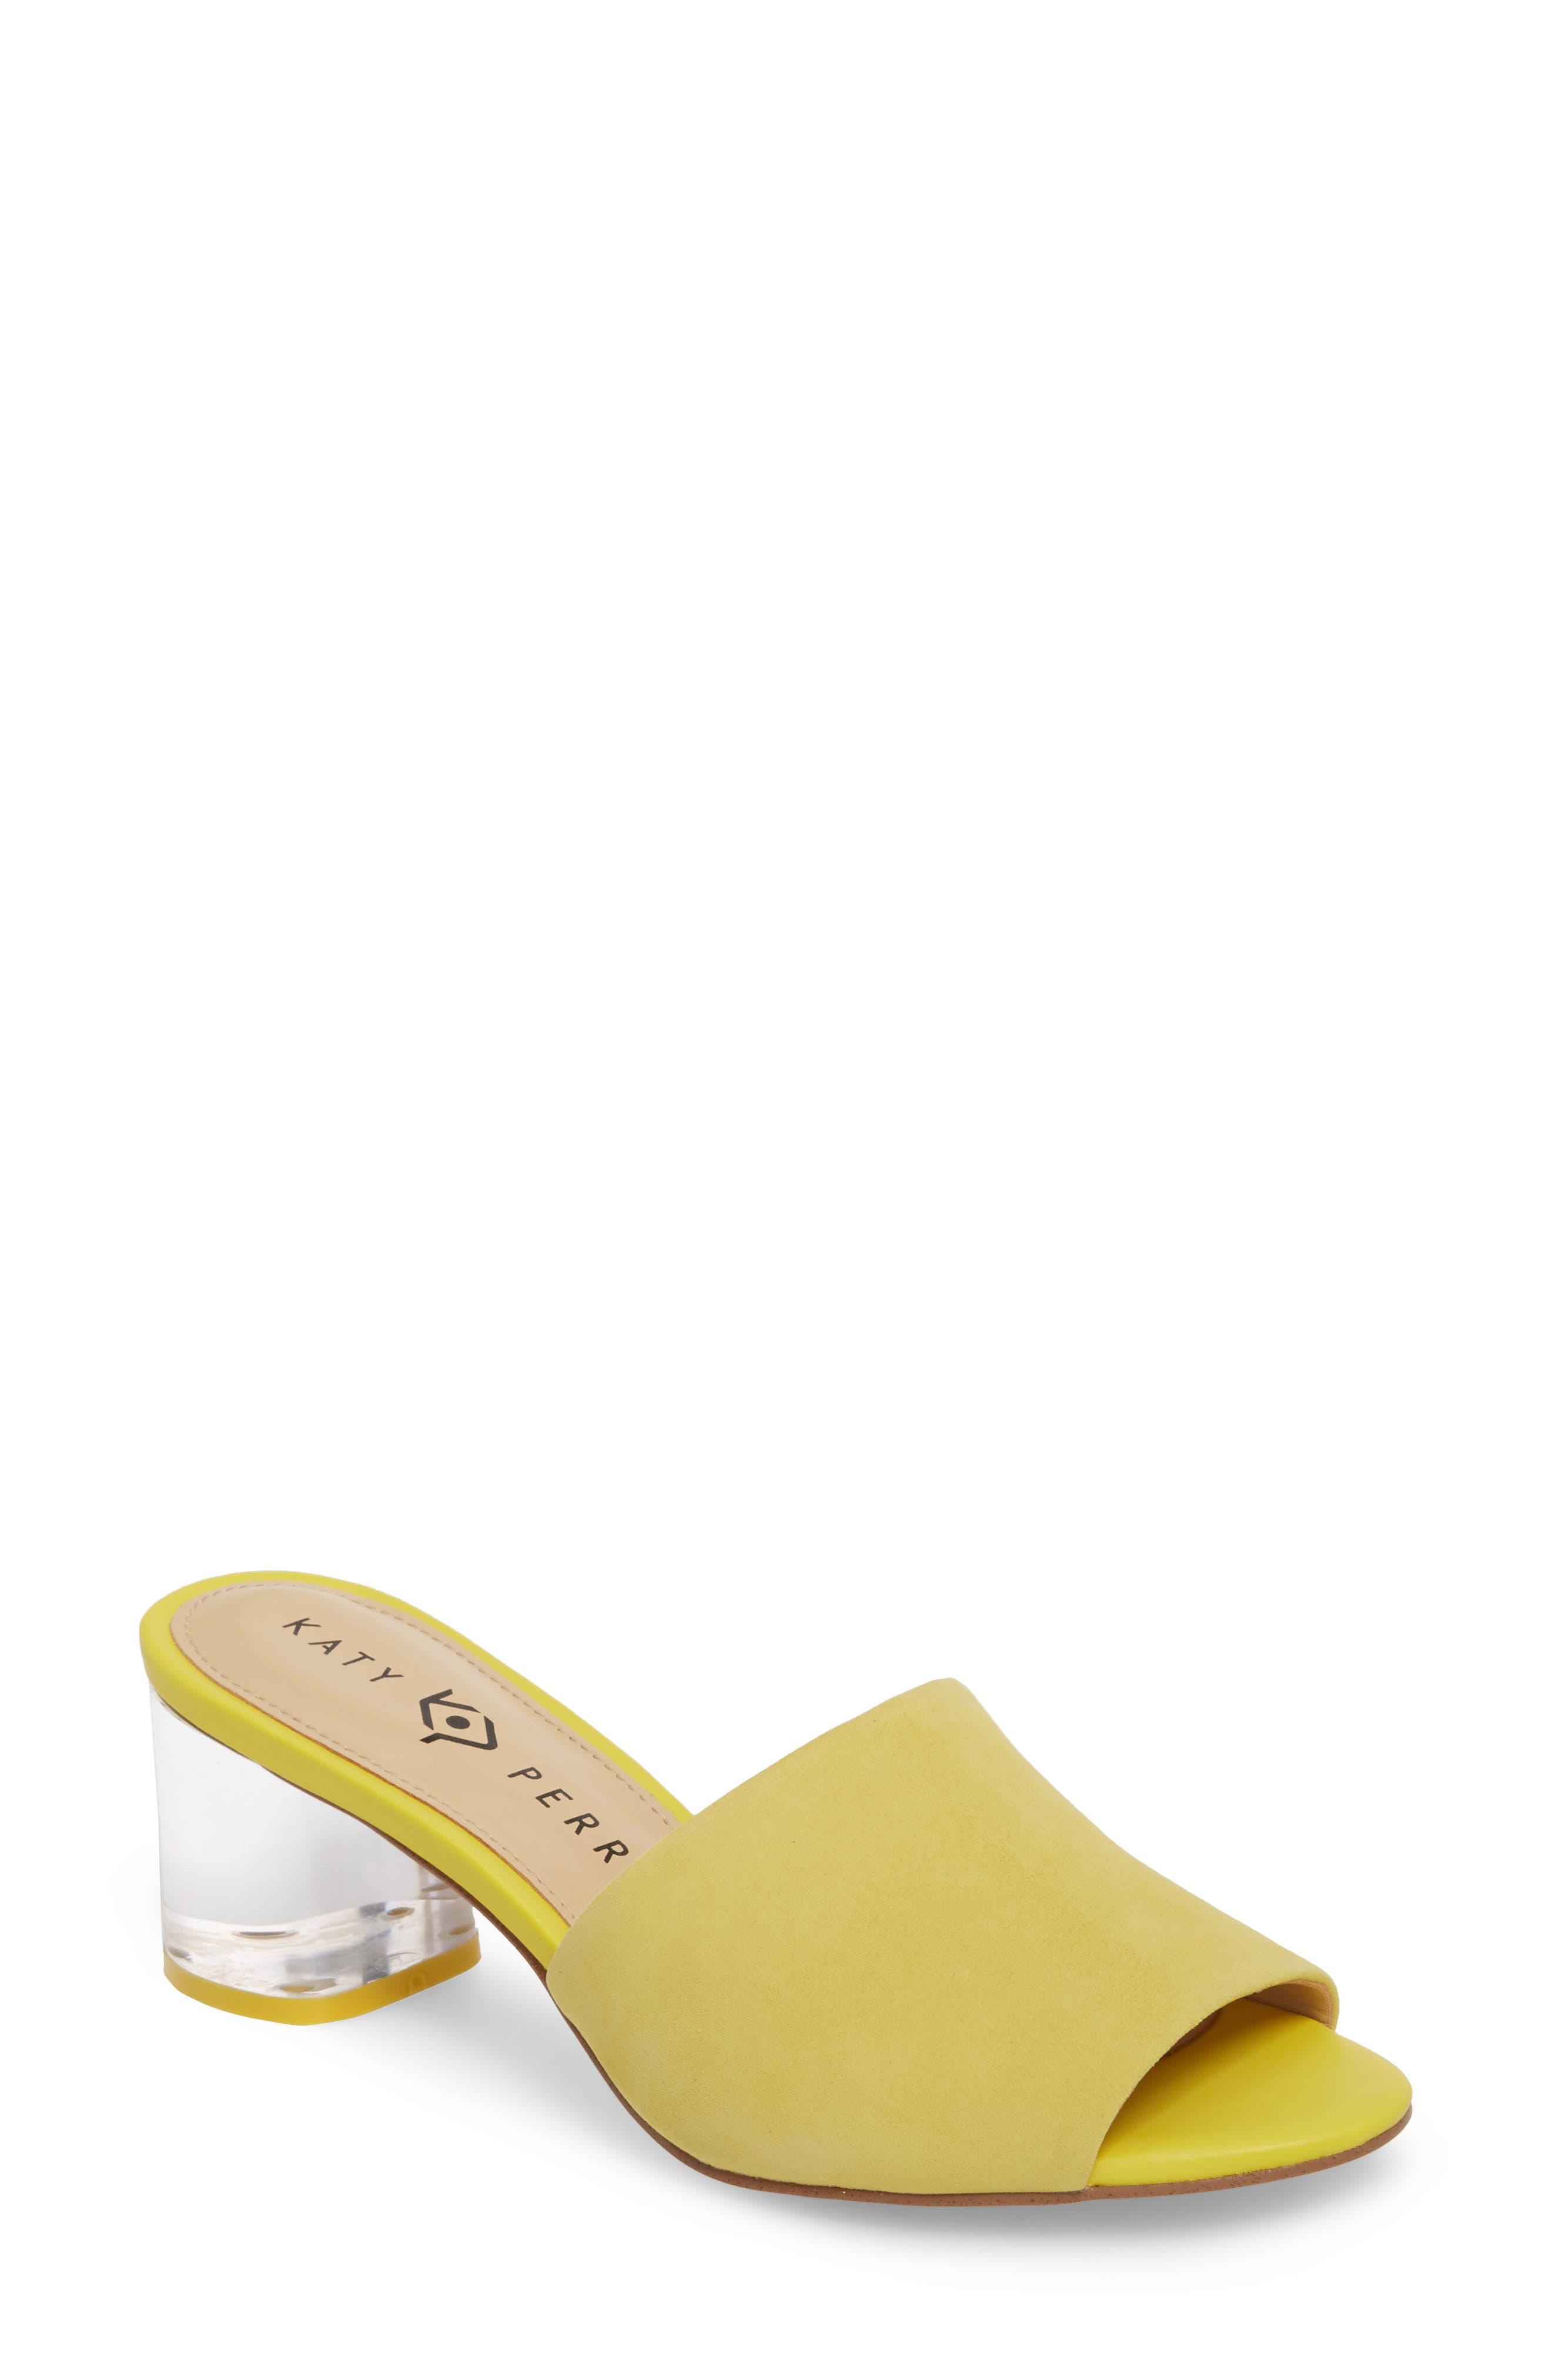 The Kaitlynn Slide Sandal,                             Main thumbnail 1, color,                             YELLOW SUEDE